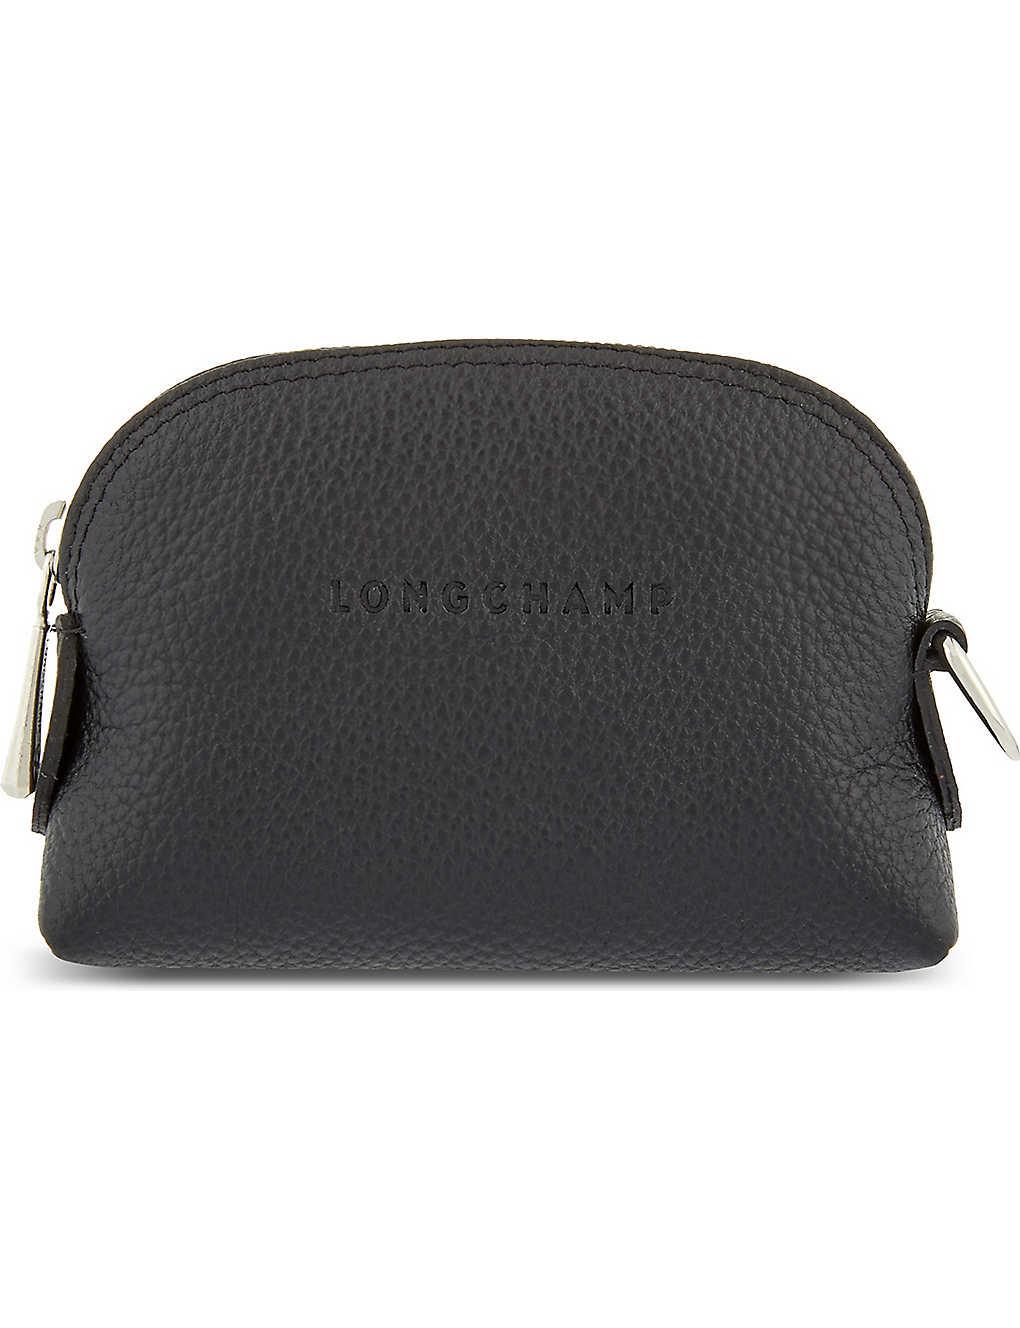 LONGCHAMP - Le Foulonne leather coin purse  b48642bf664a7